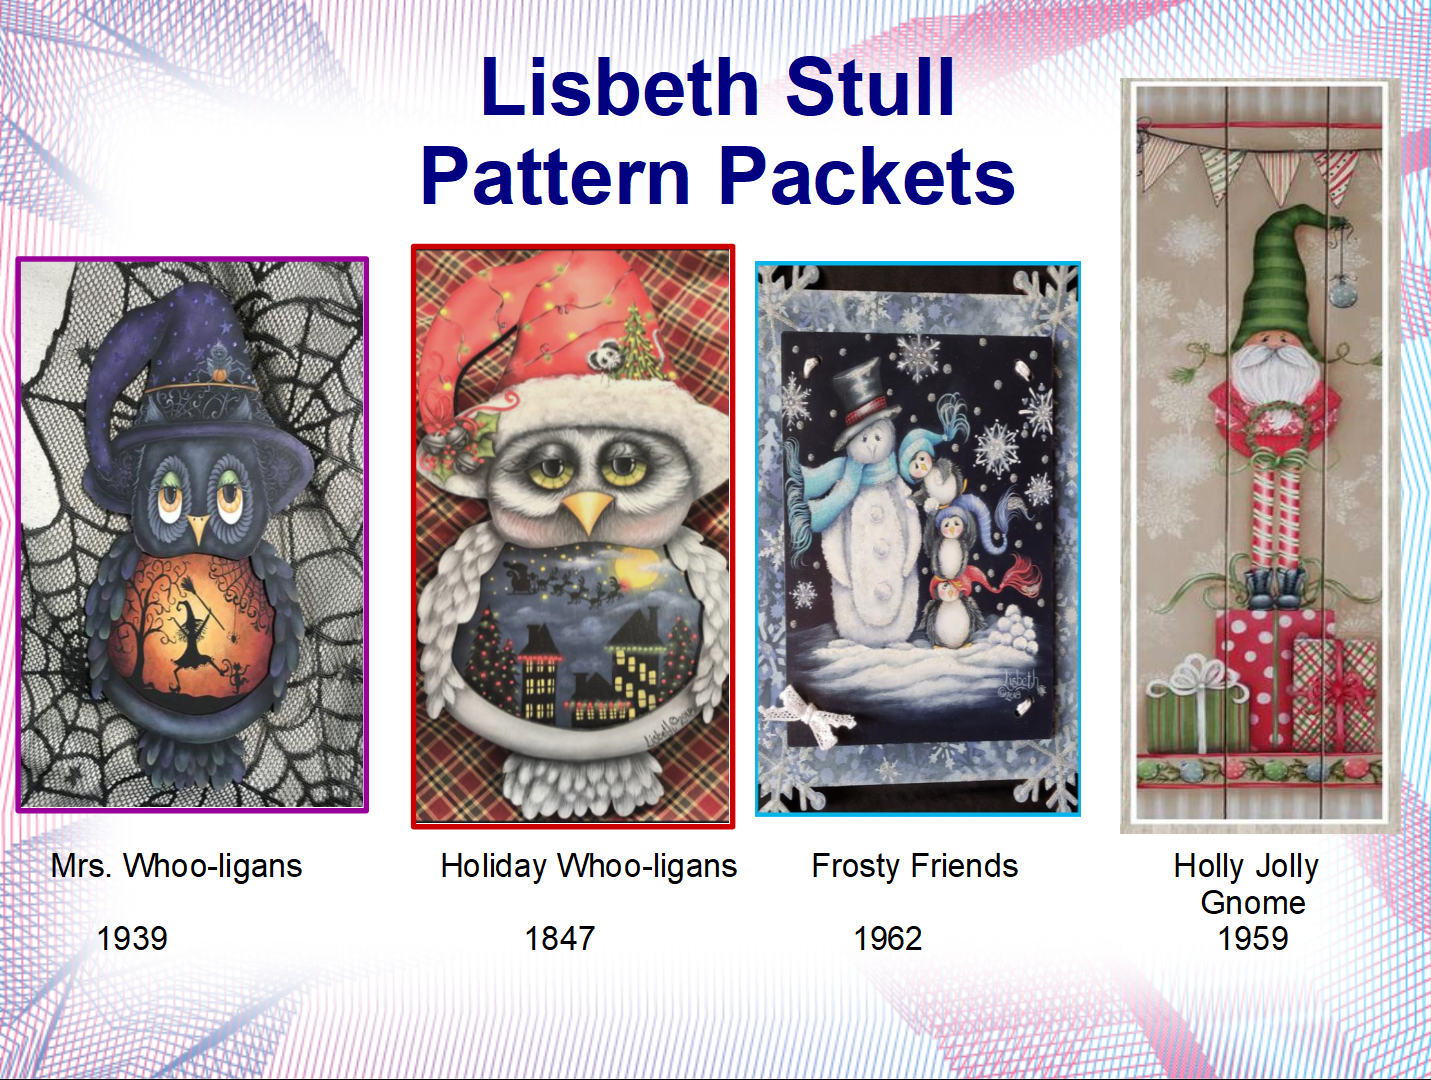 lisbeth-stull-collage-20191016.jpg